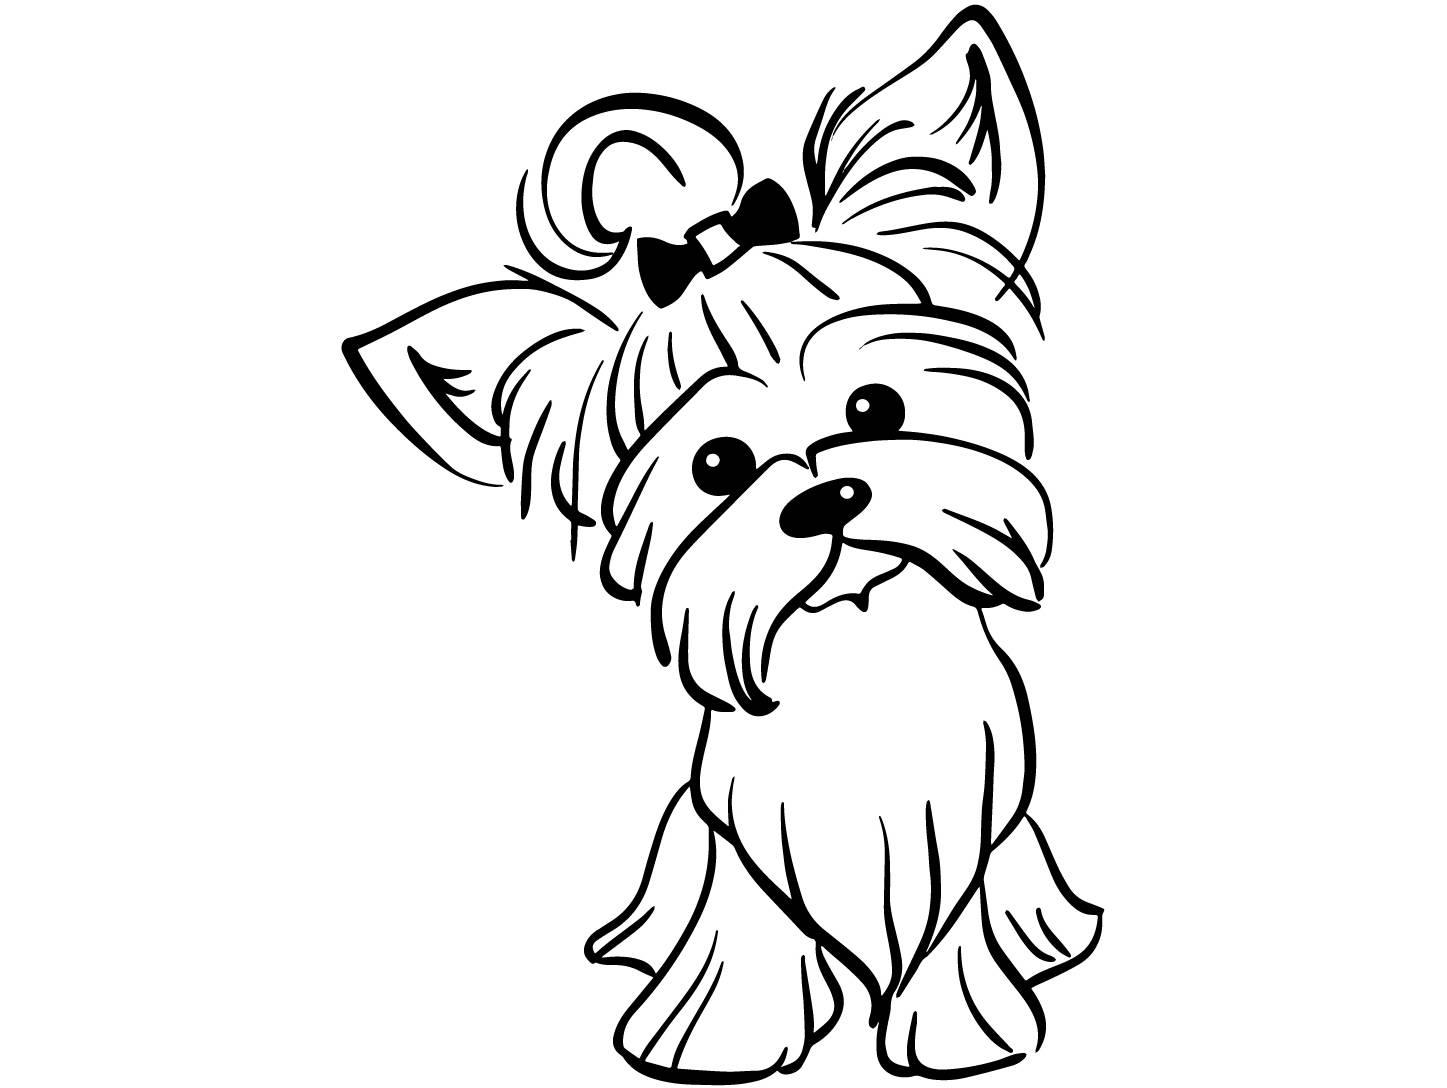 Yorkie Cartoon Drawing At Getdrawings